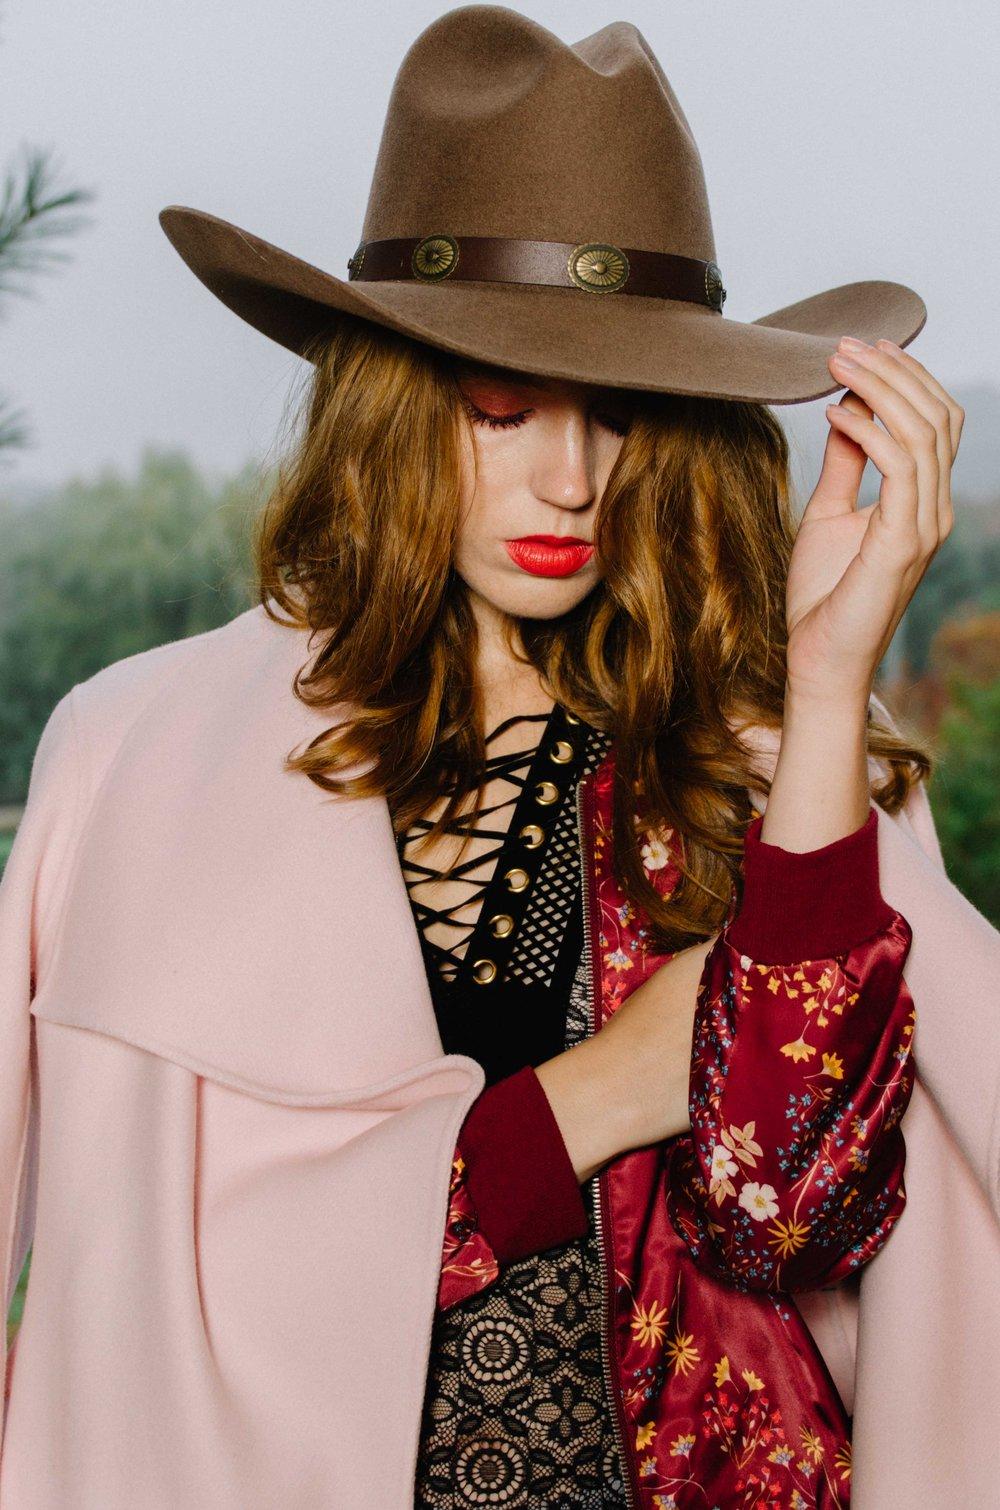 lianacarbone_fashionphotography-15.jpg